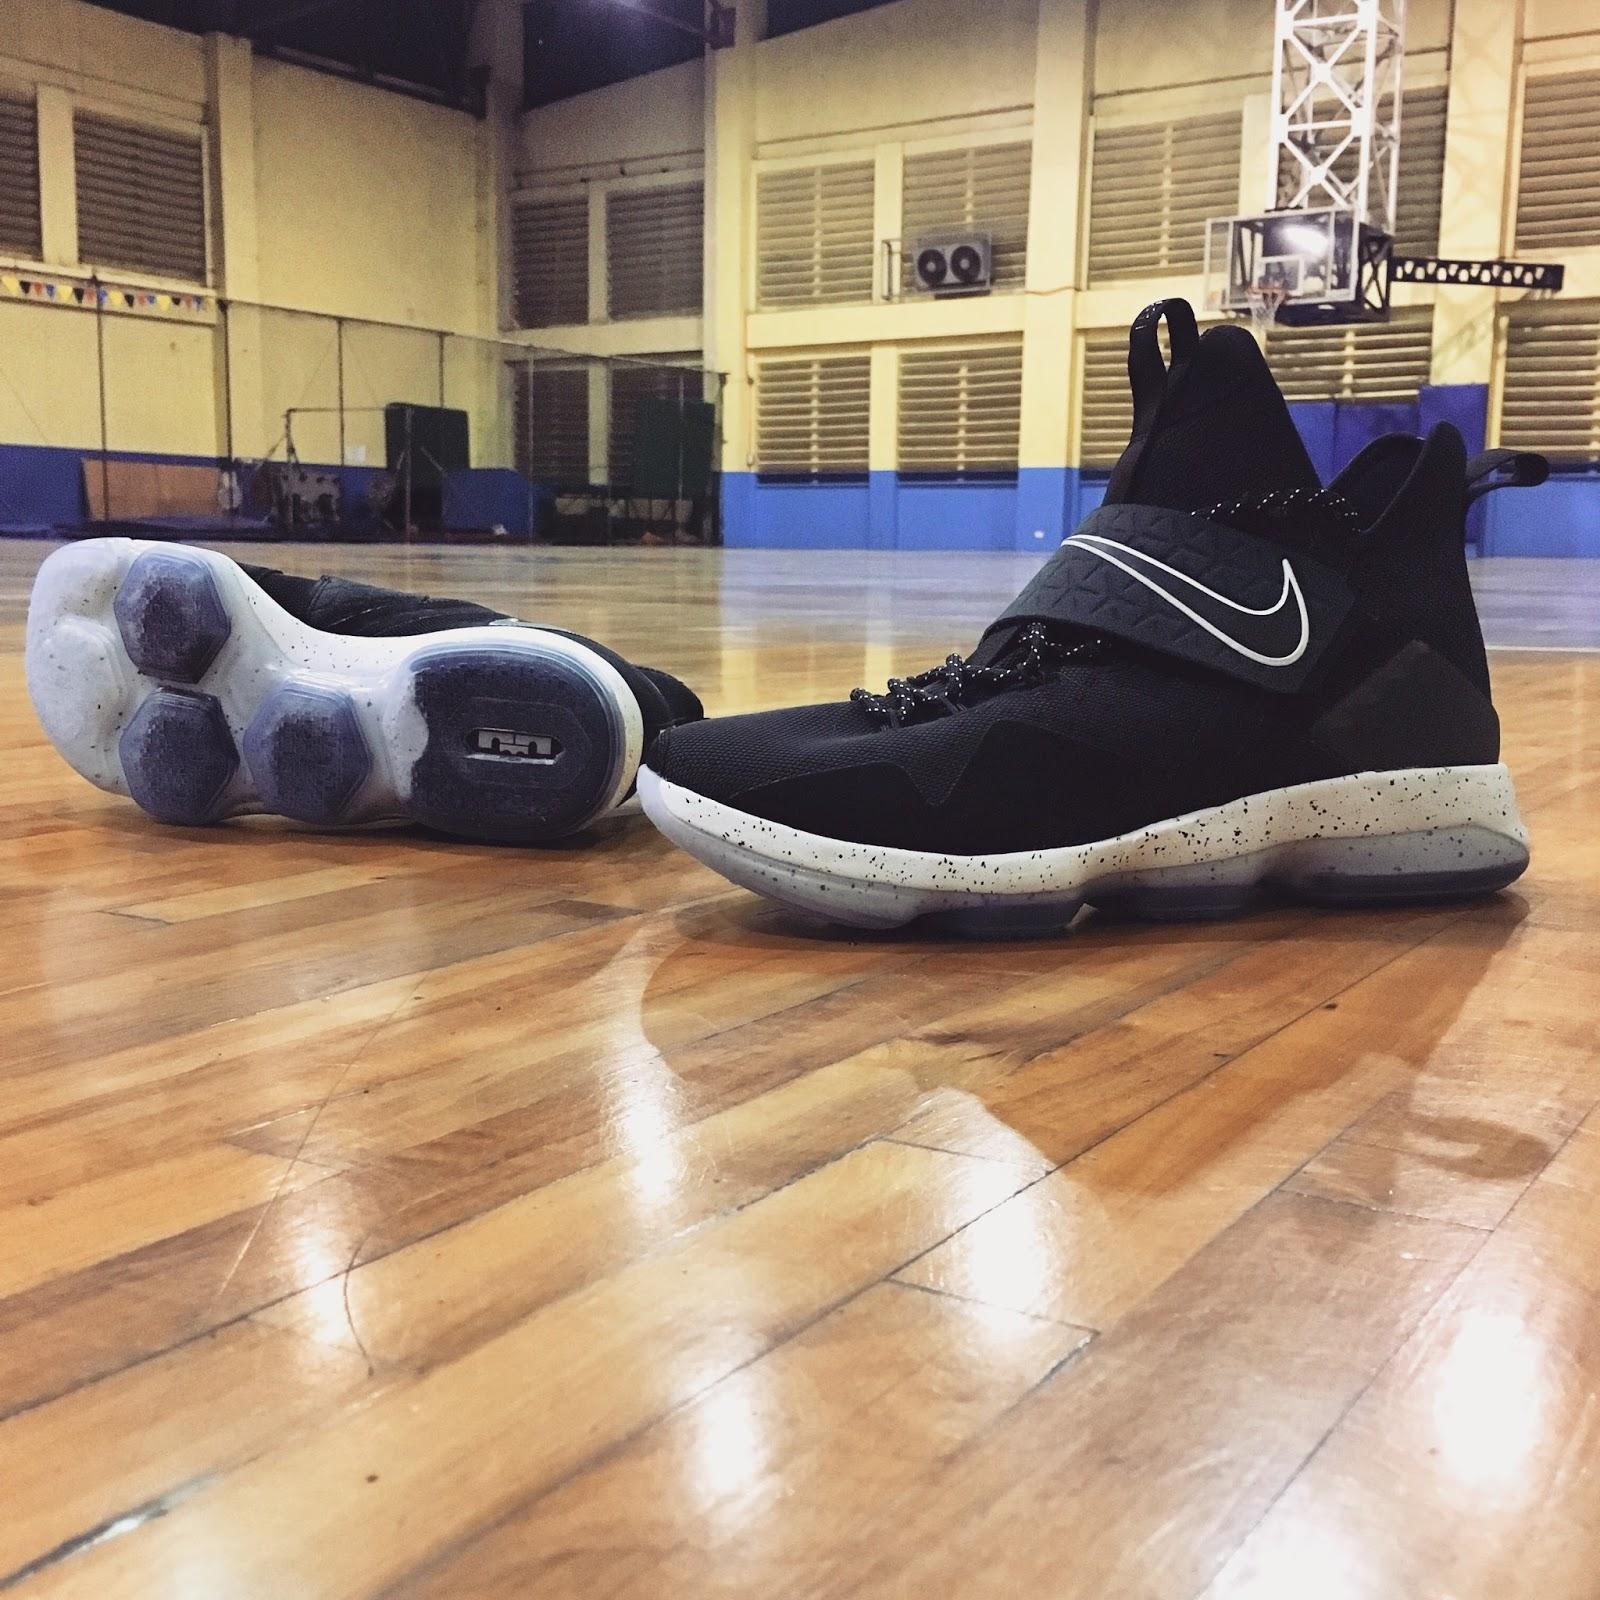 e2f0953baa5c Nike LeBron 14 Performance Review